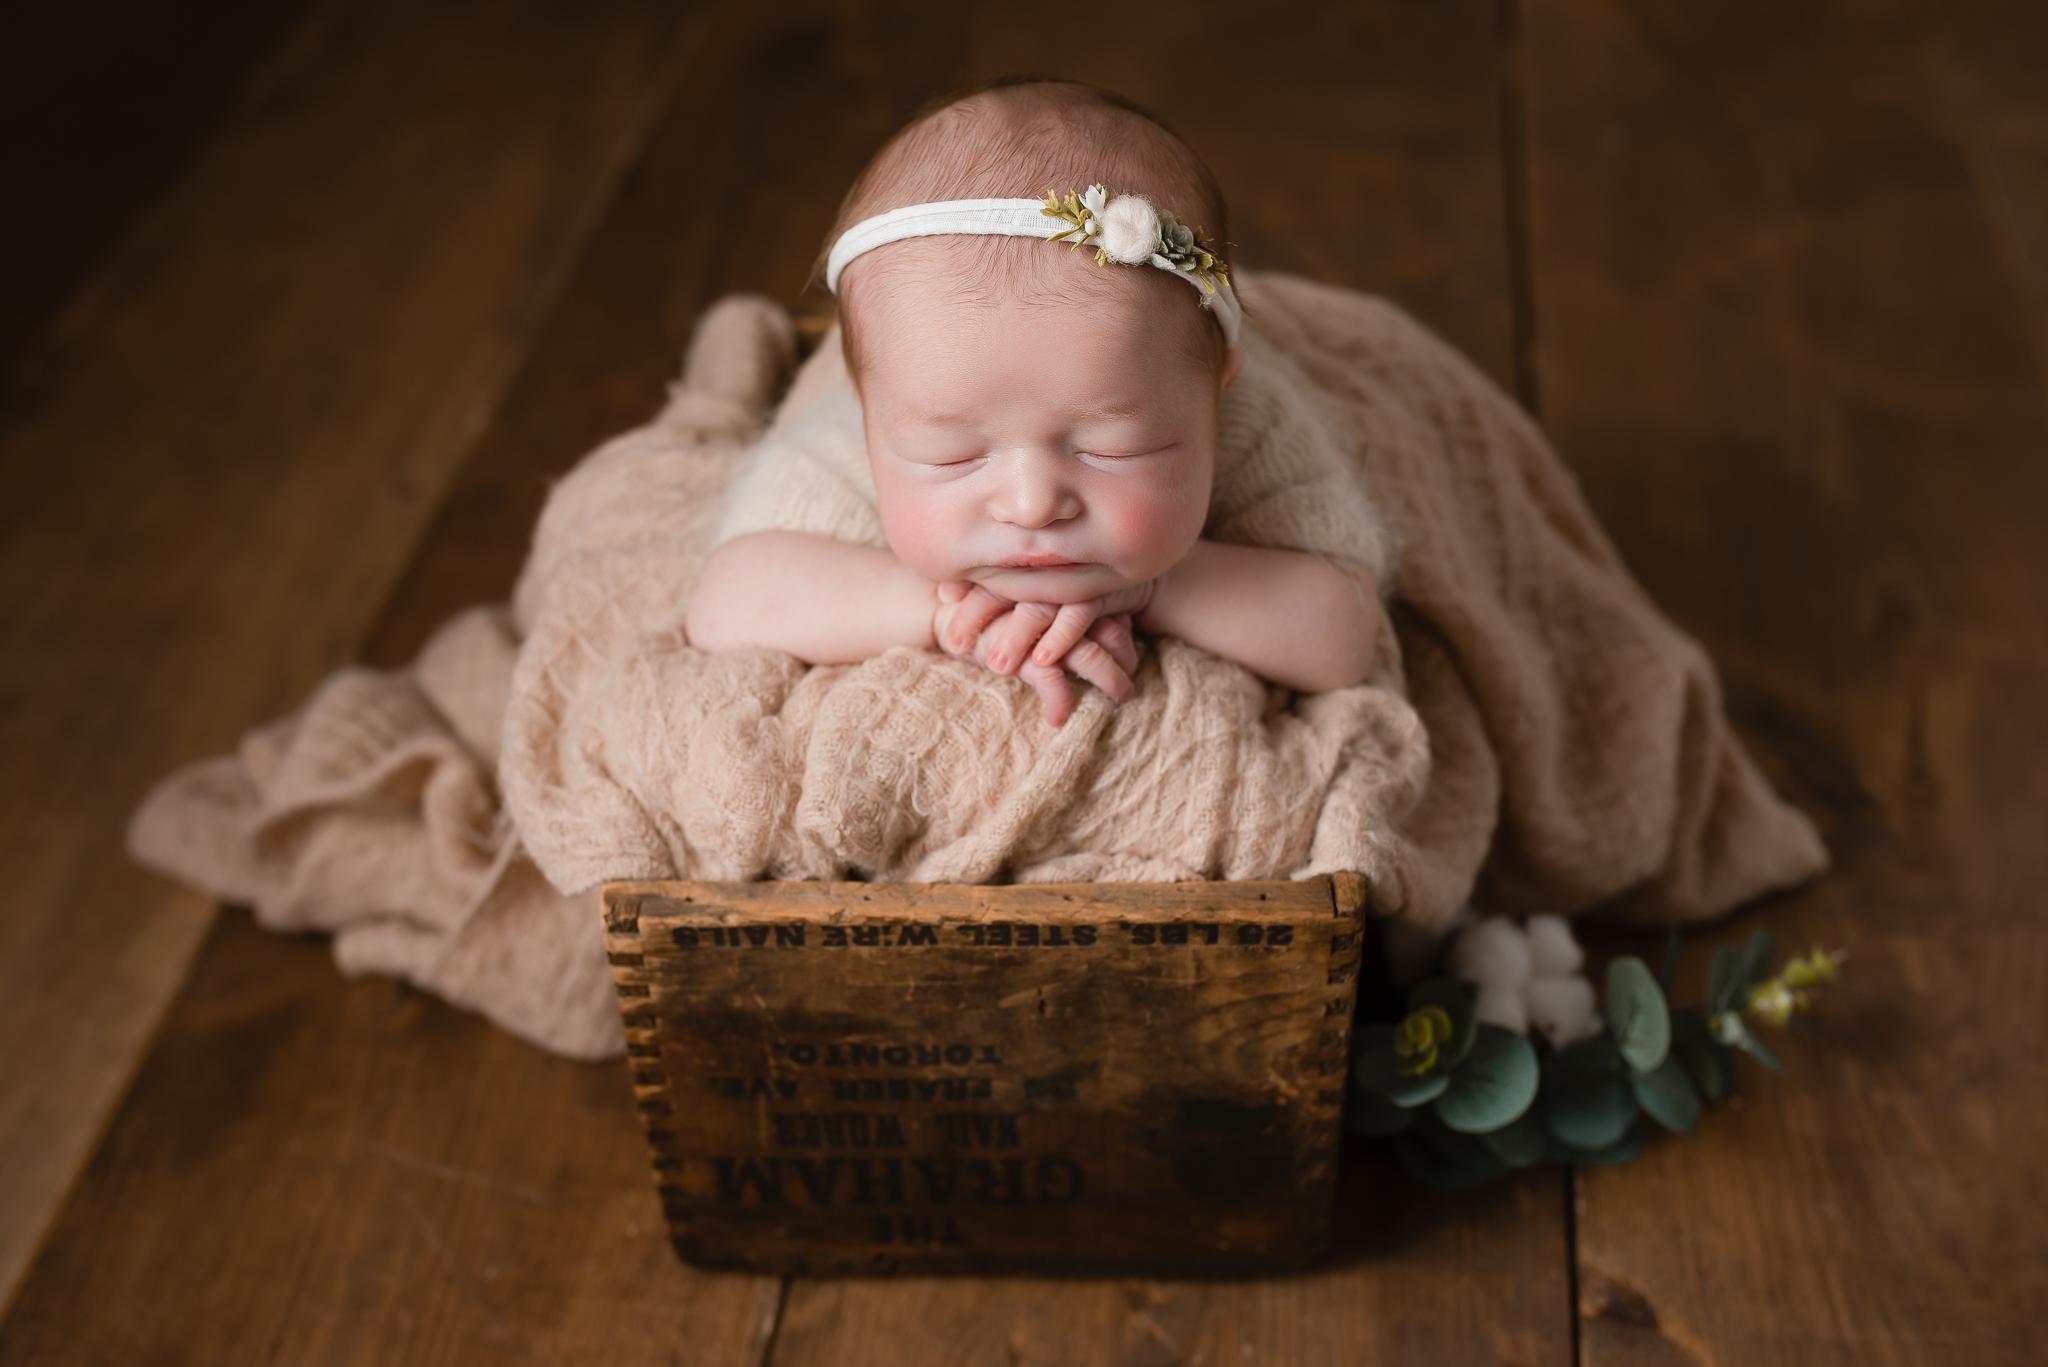 Newborn434NaomiLuciennePhotography032019-Edit.jpg